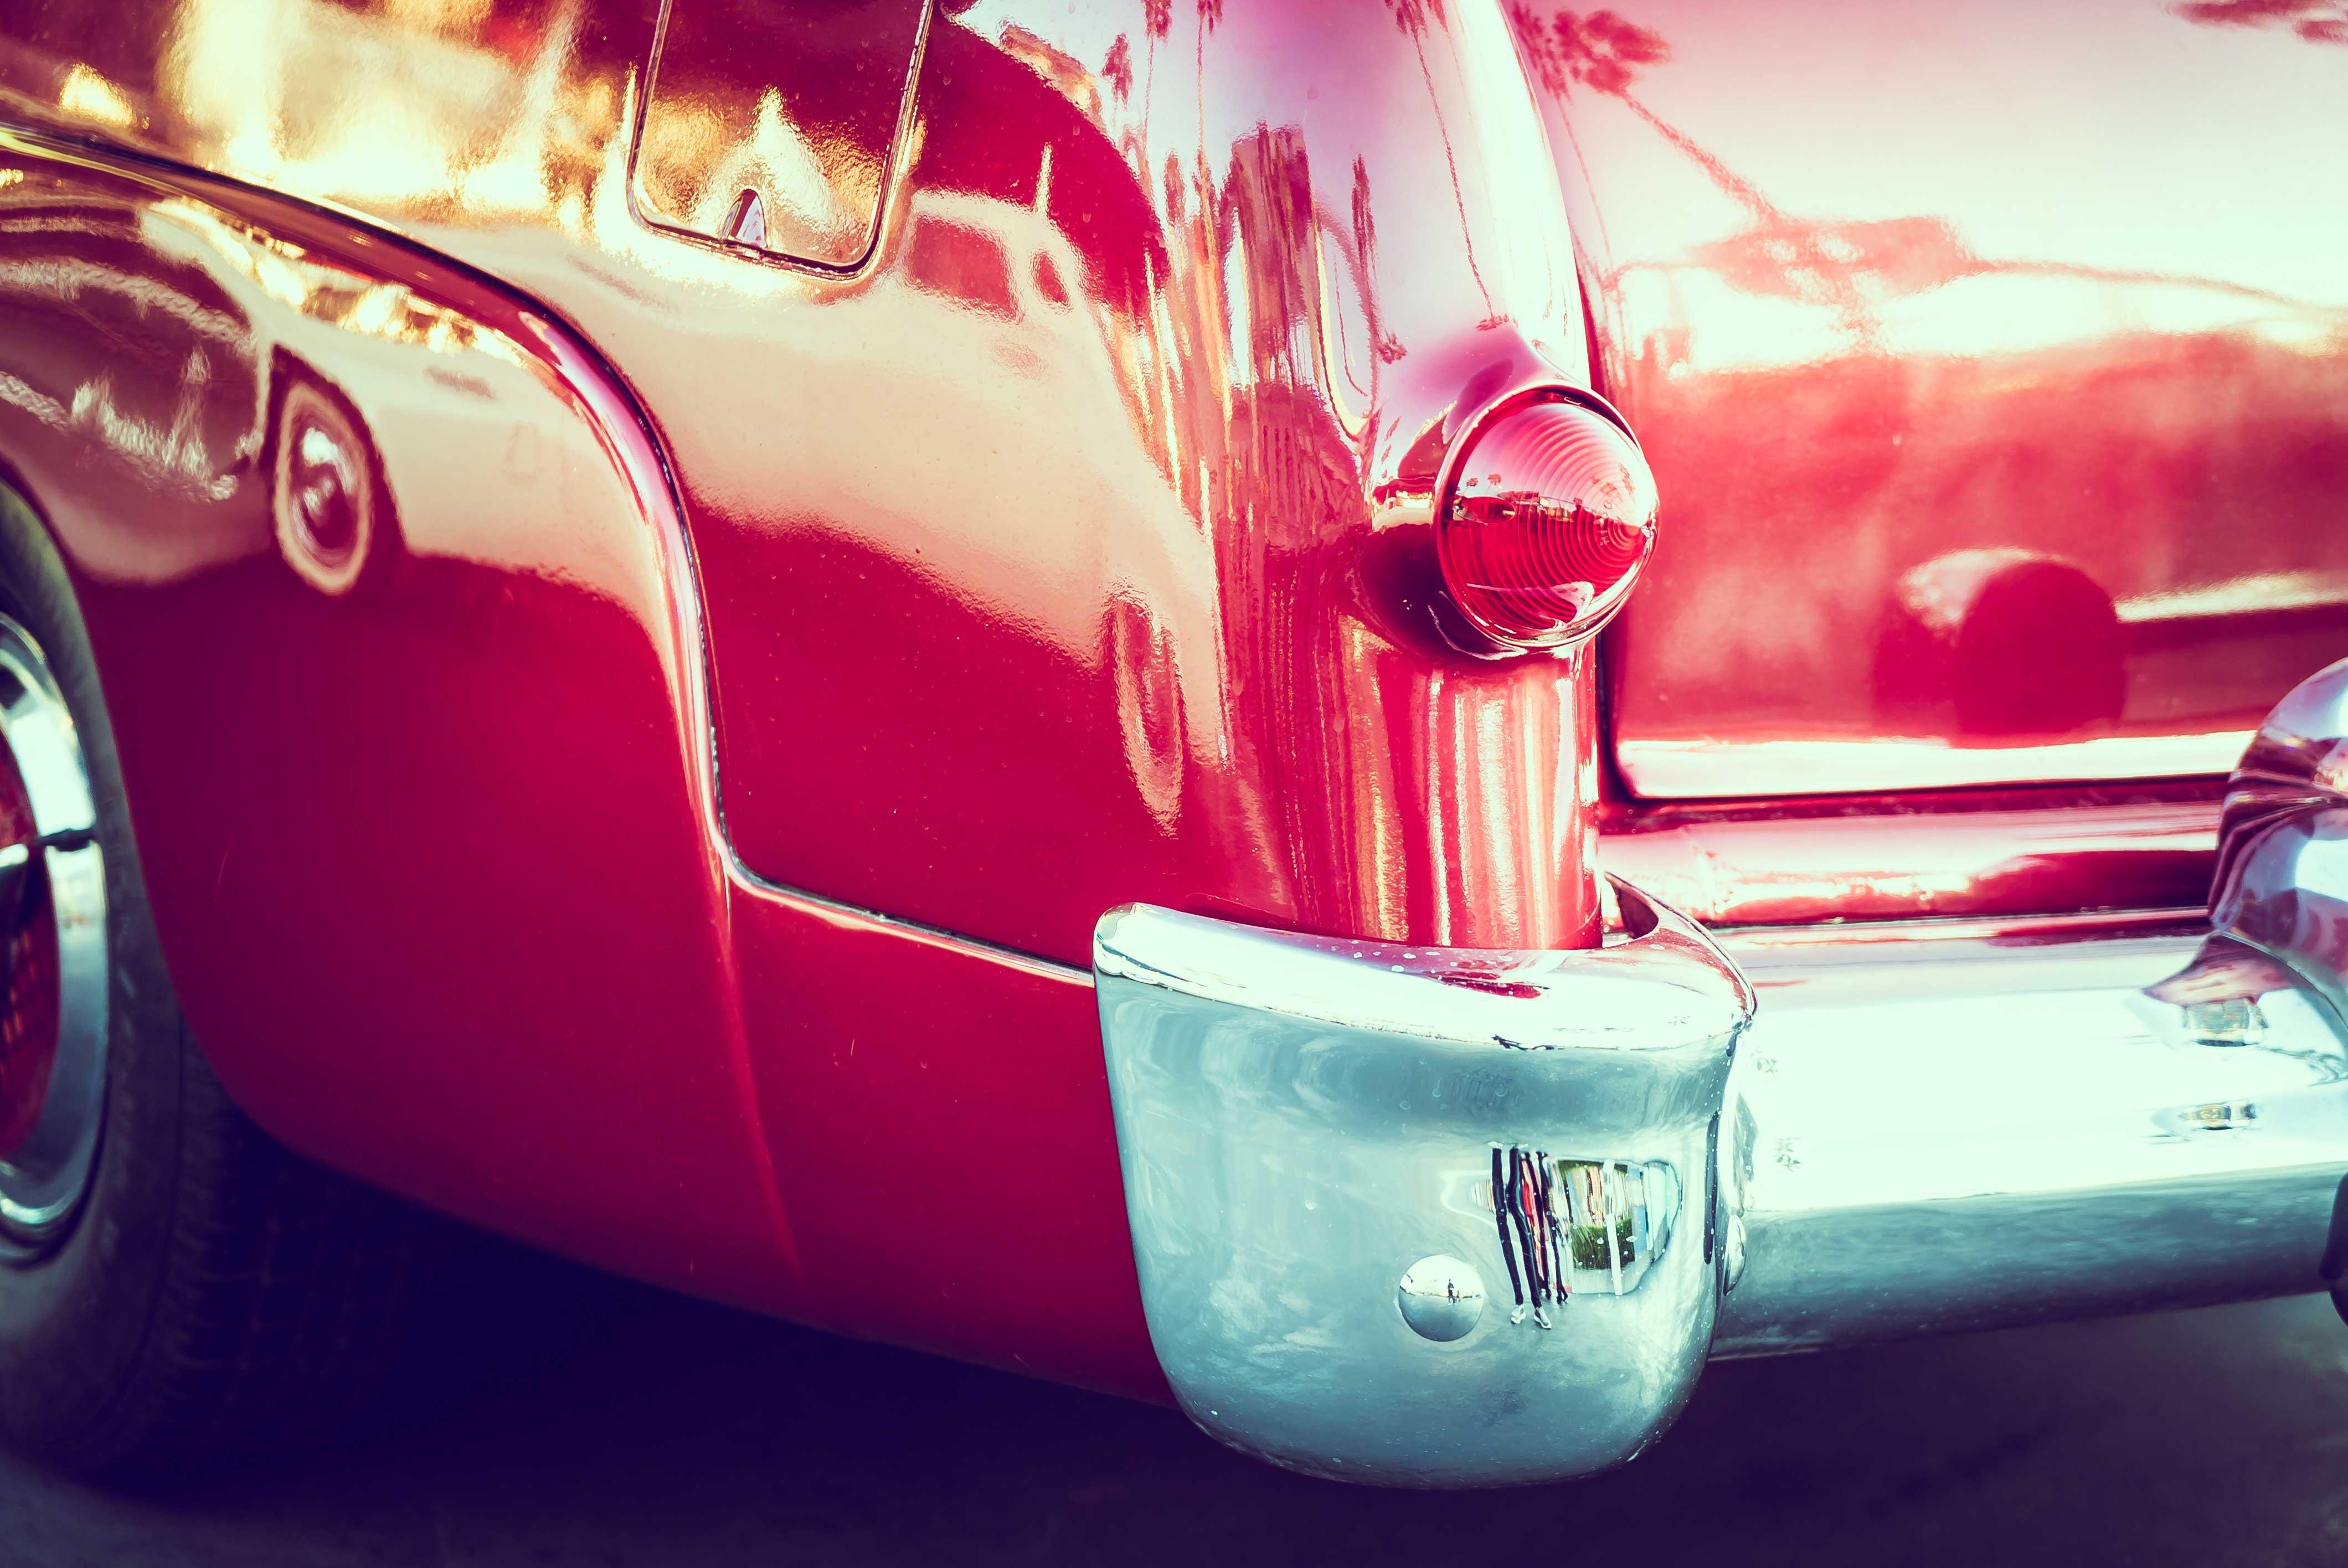 Carrosserie voitures anciennes